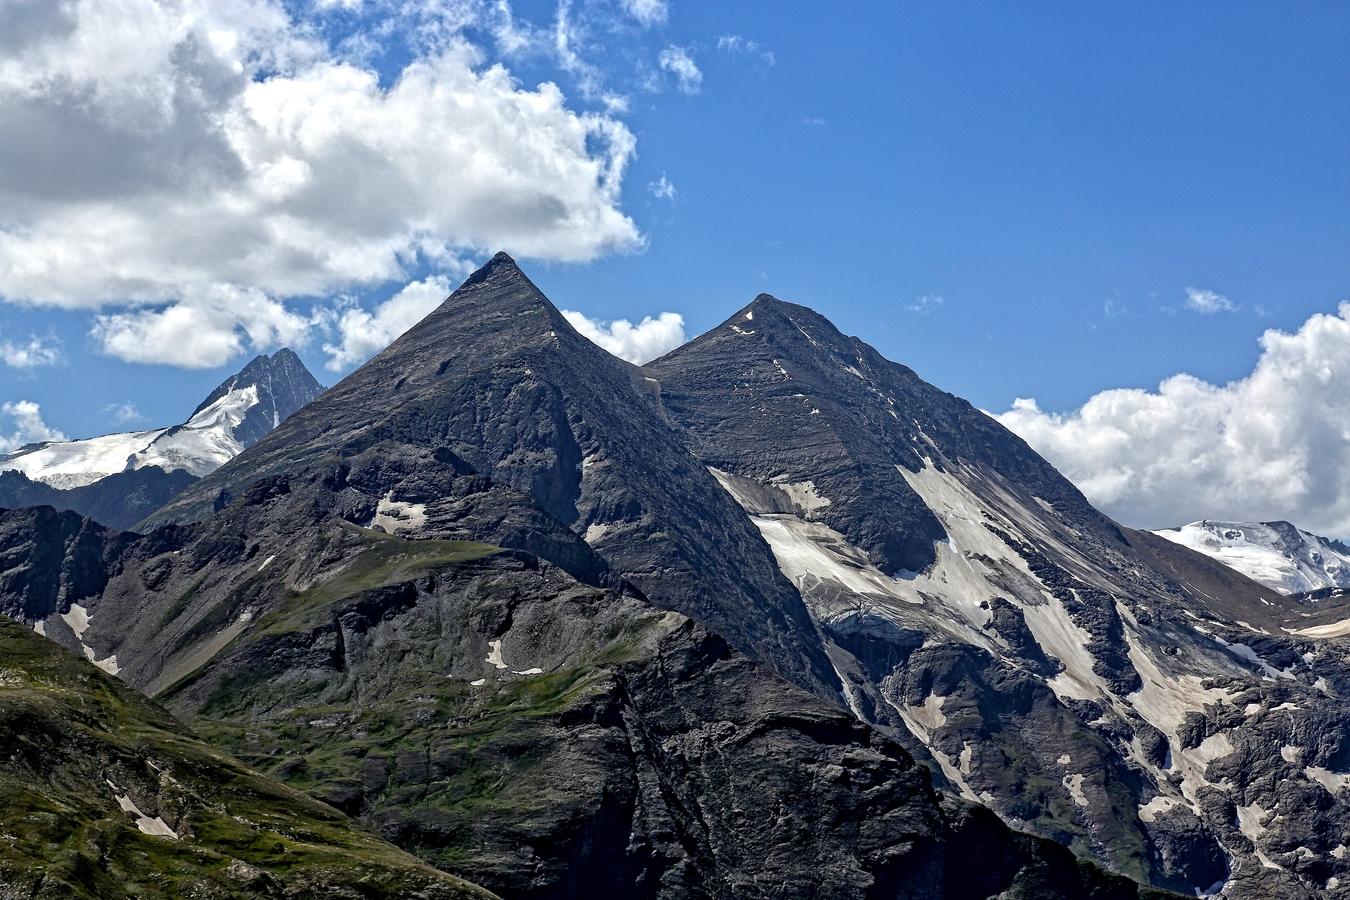 Großglockner3798 m-Sinwelleck 3261m-Fuscherkarkopf 3331 m